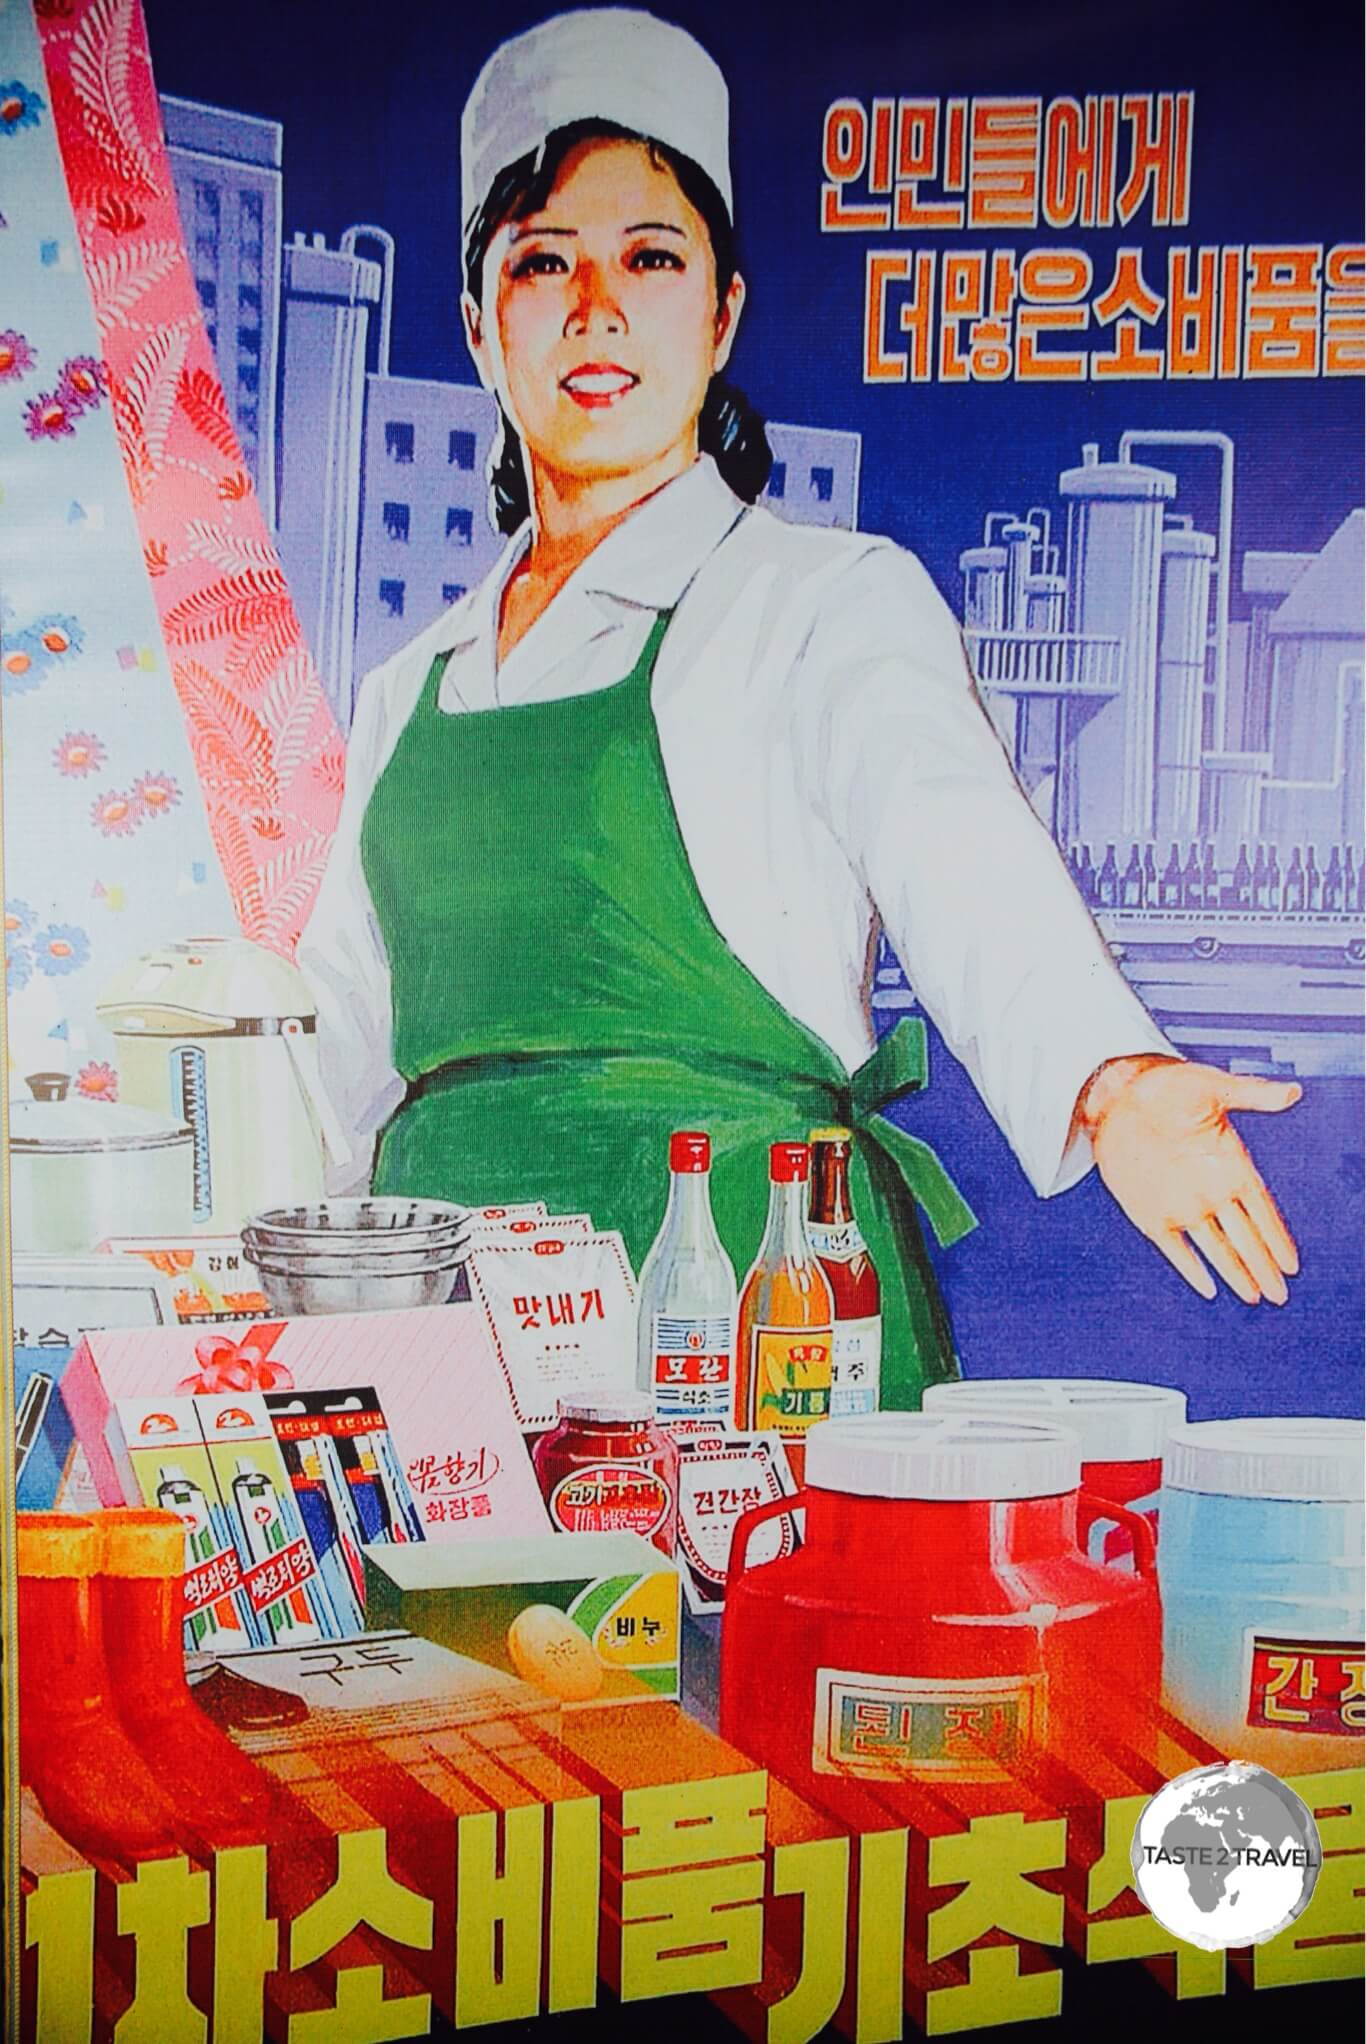 Propaganda poster at the Paeksonri Foodstuffs factory near Nampo.